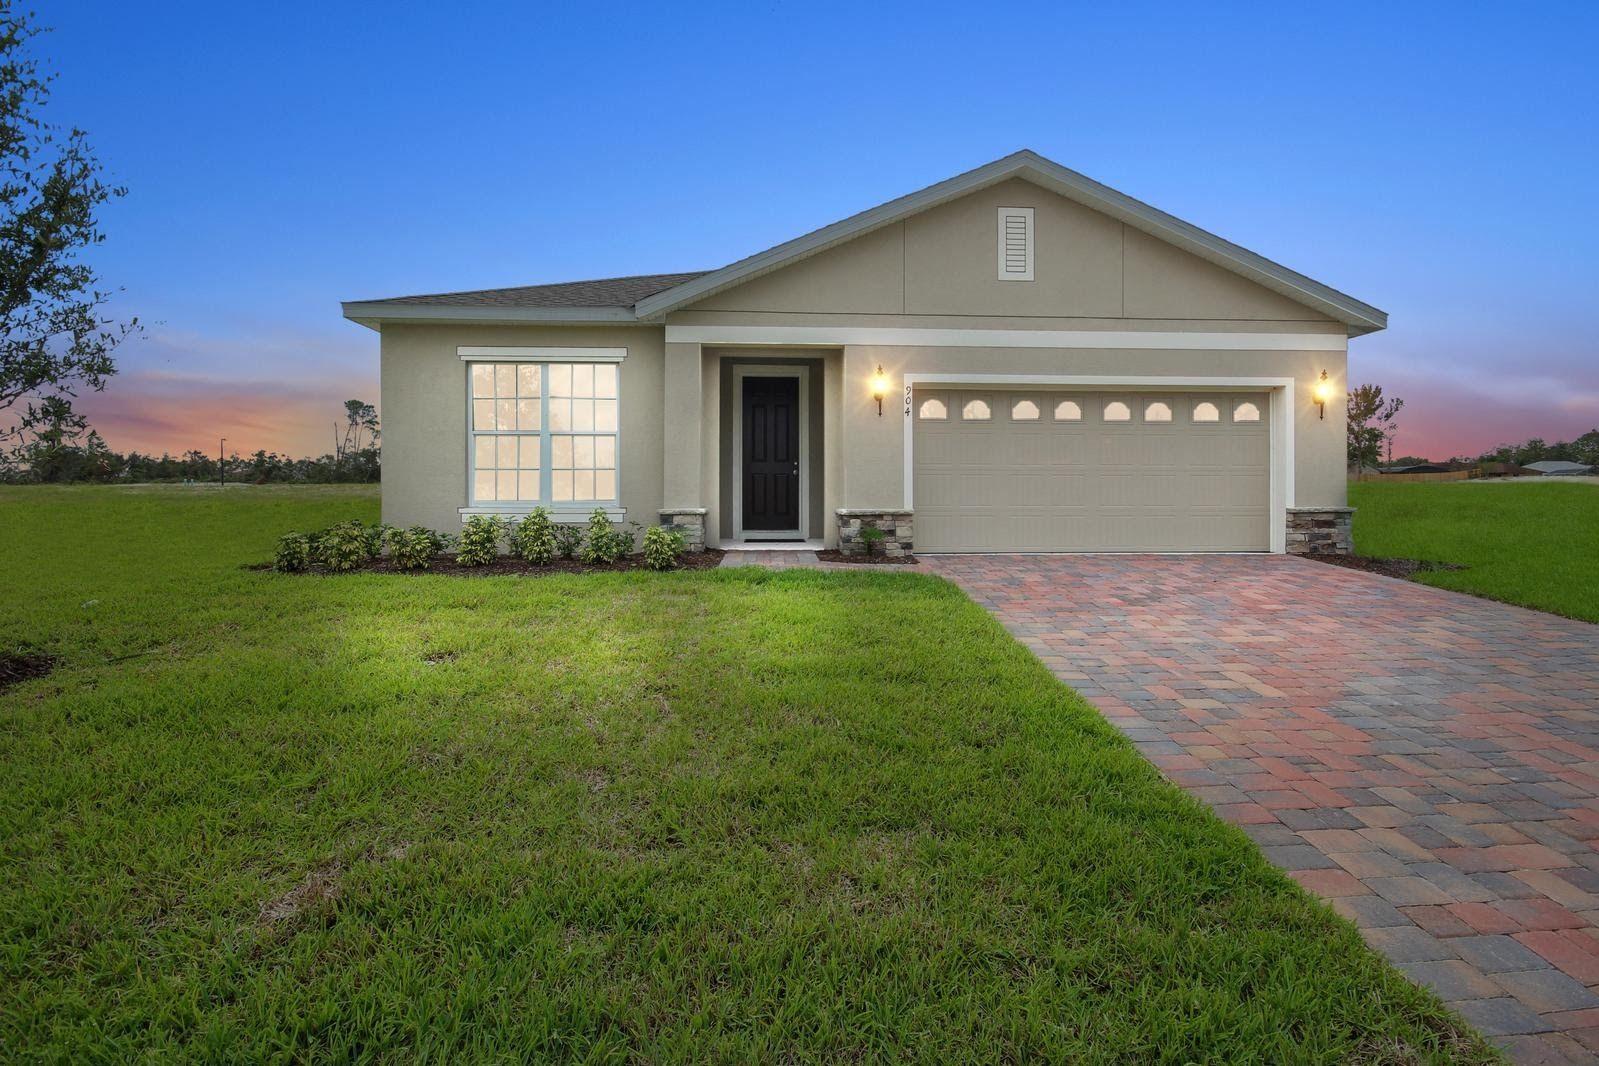 Photo of Parkland in Clermont, FL 34714